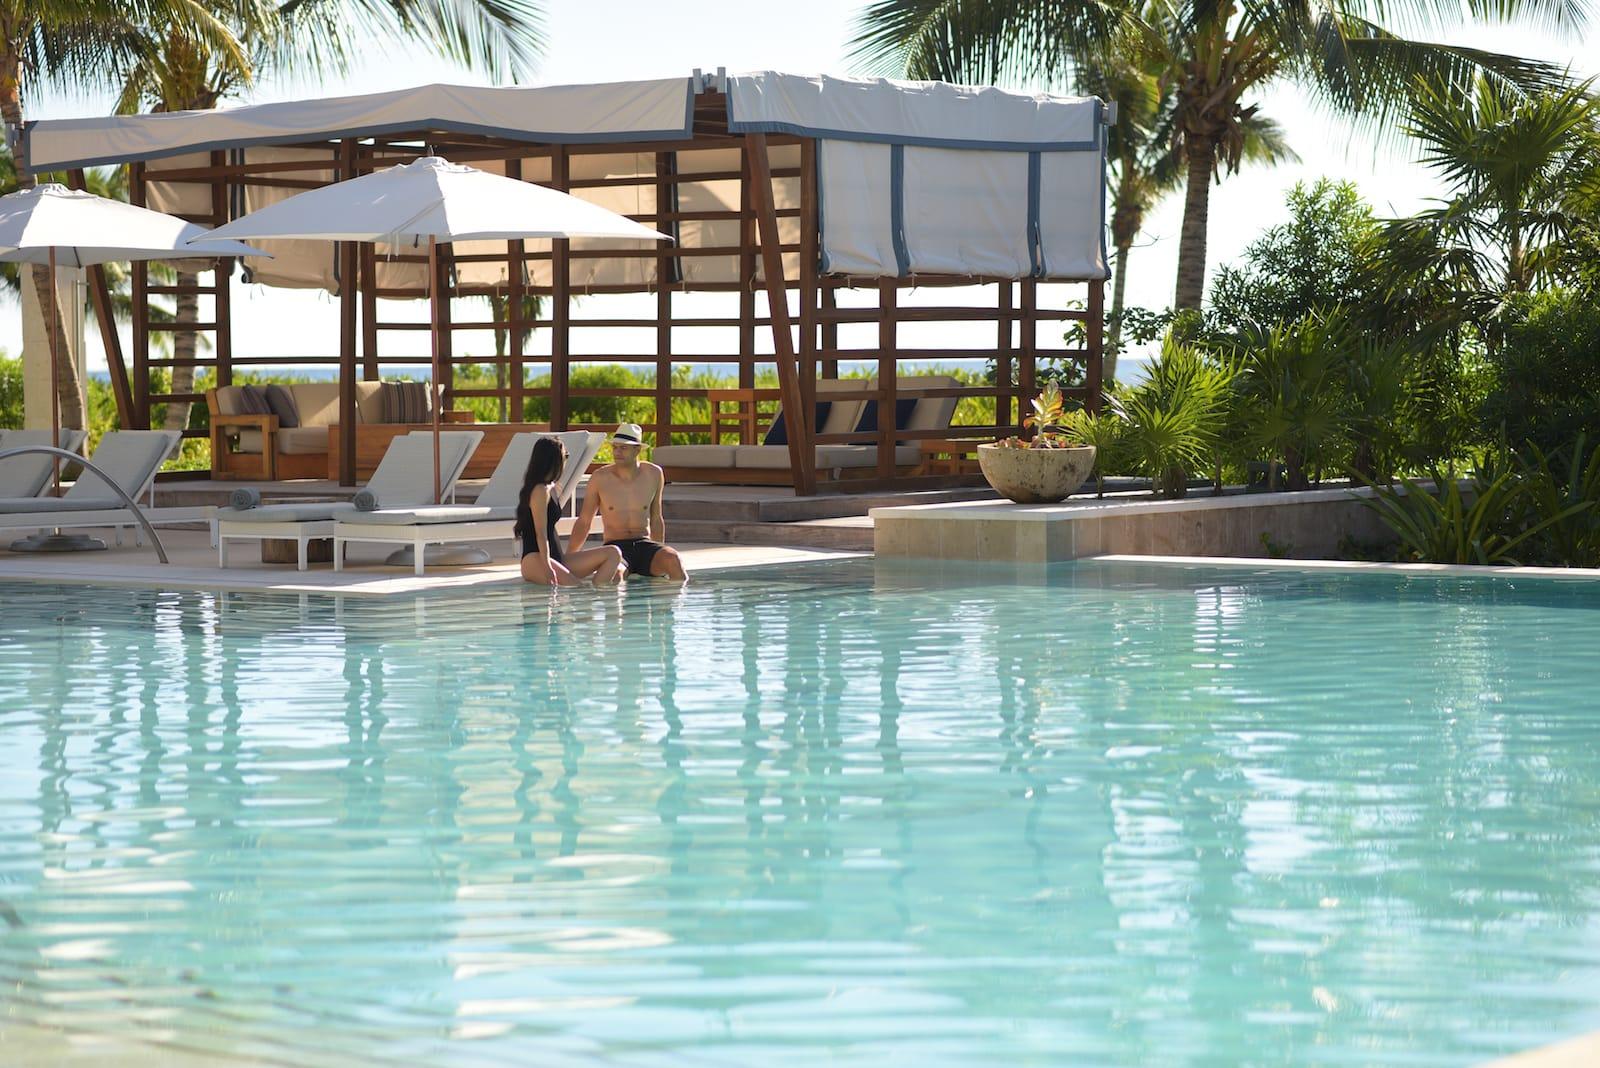 luxury swimming pool adventure all inclusive resort mexico romantic vacation